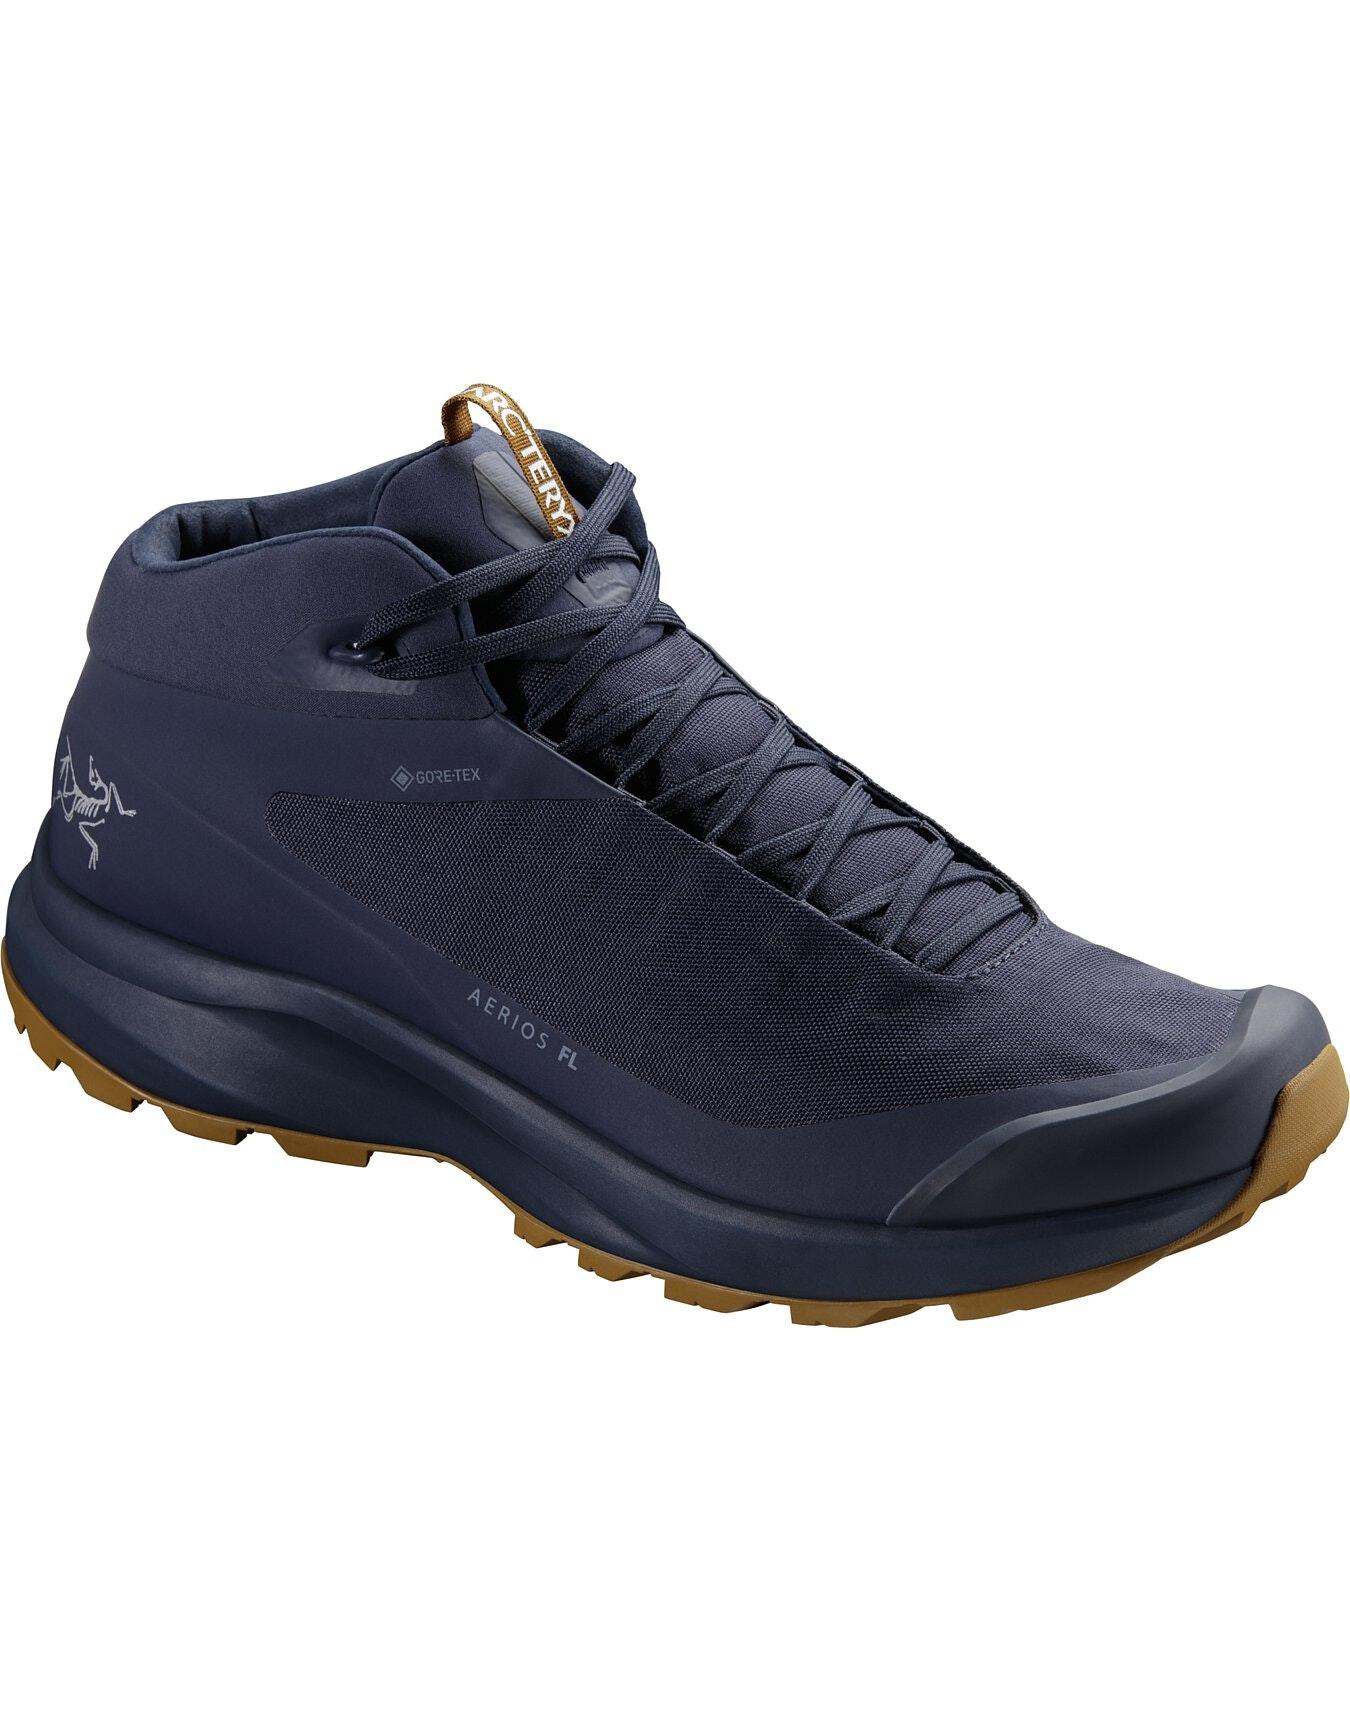 Aerios FL Mid GTX Shoe Cobalt Moon/Yukon